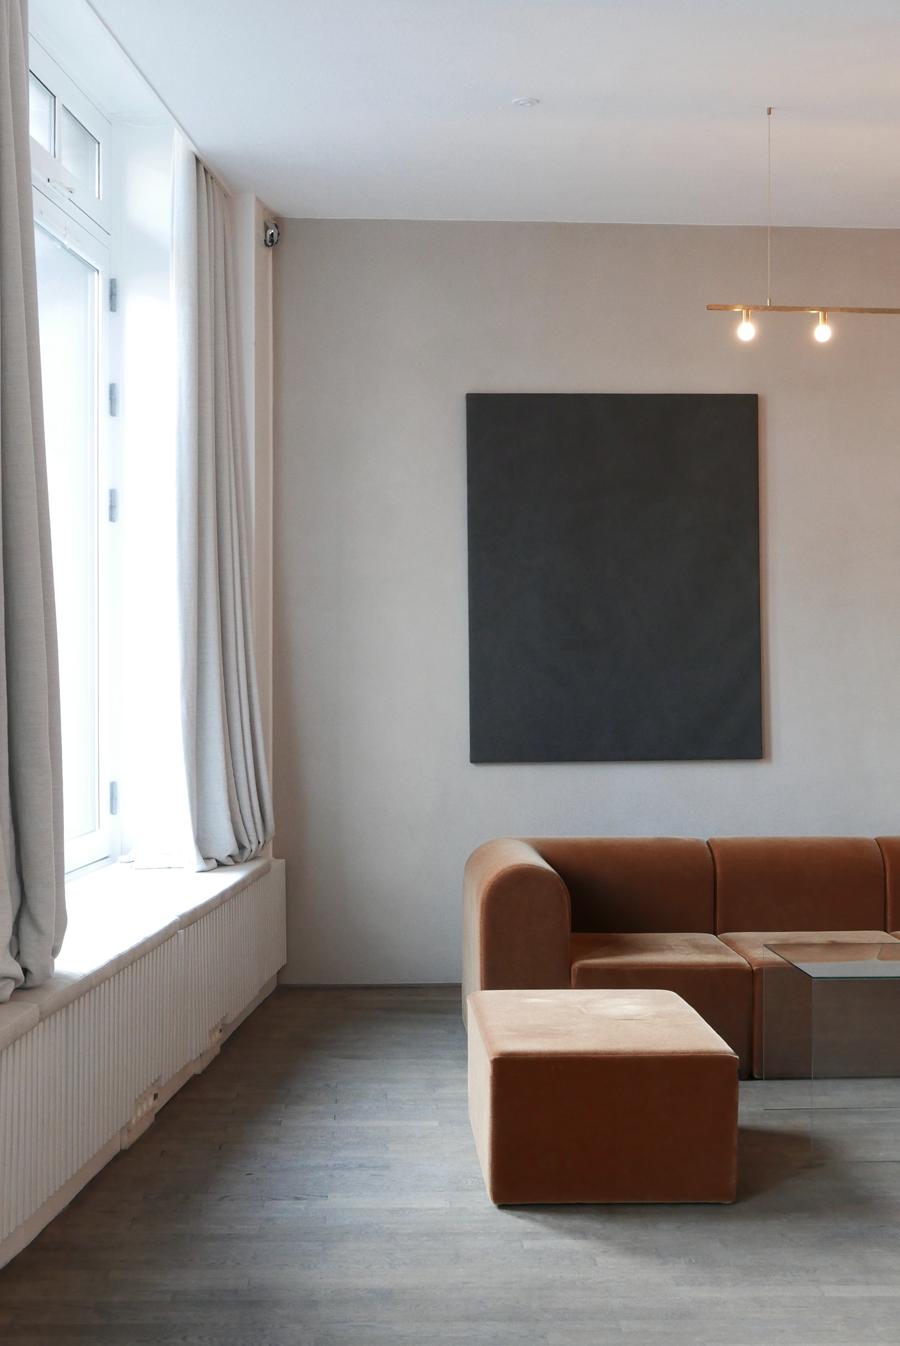 Elisabeth Heier in Copenhagen Post via Ollie & Sebs Haus